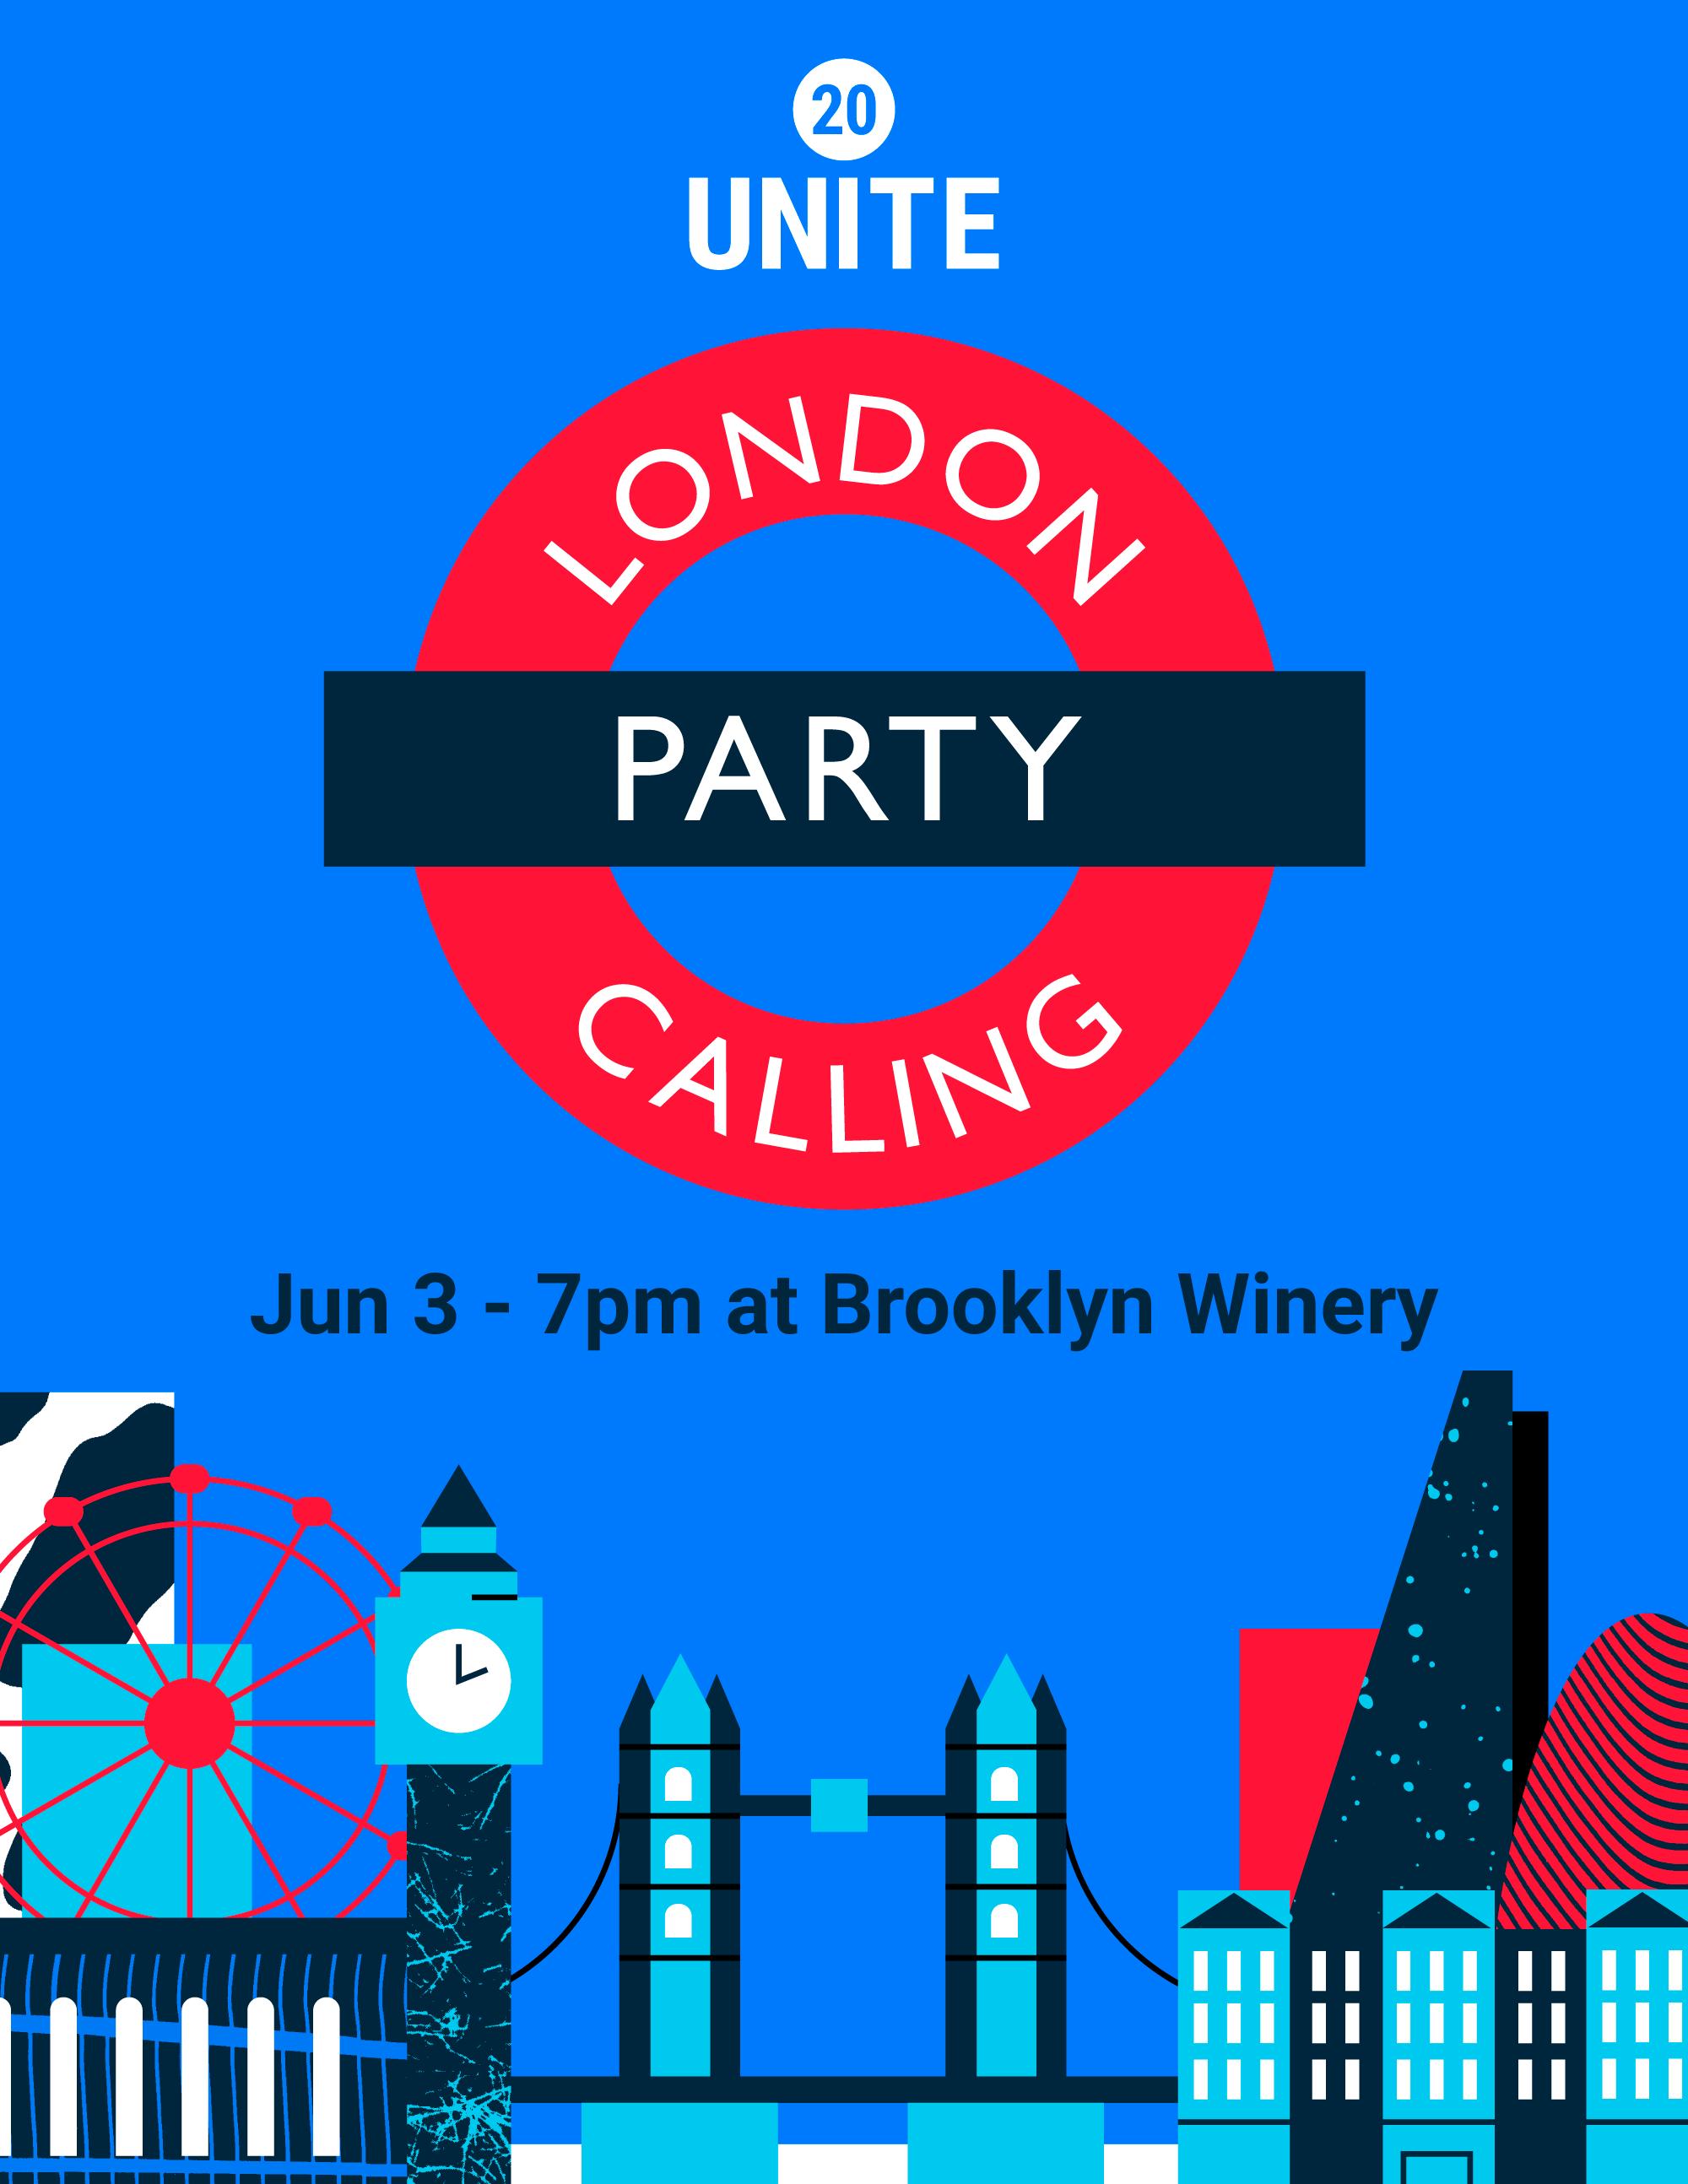 Unite 20 London Calling Party